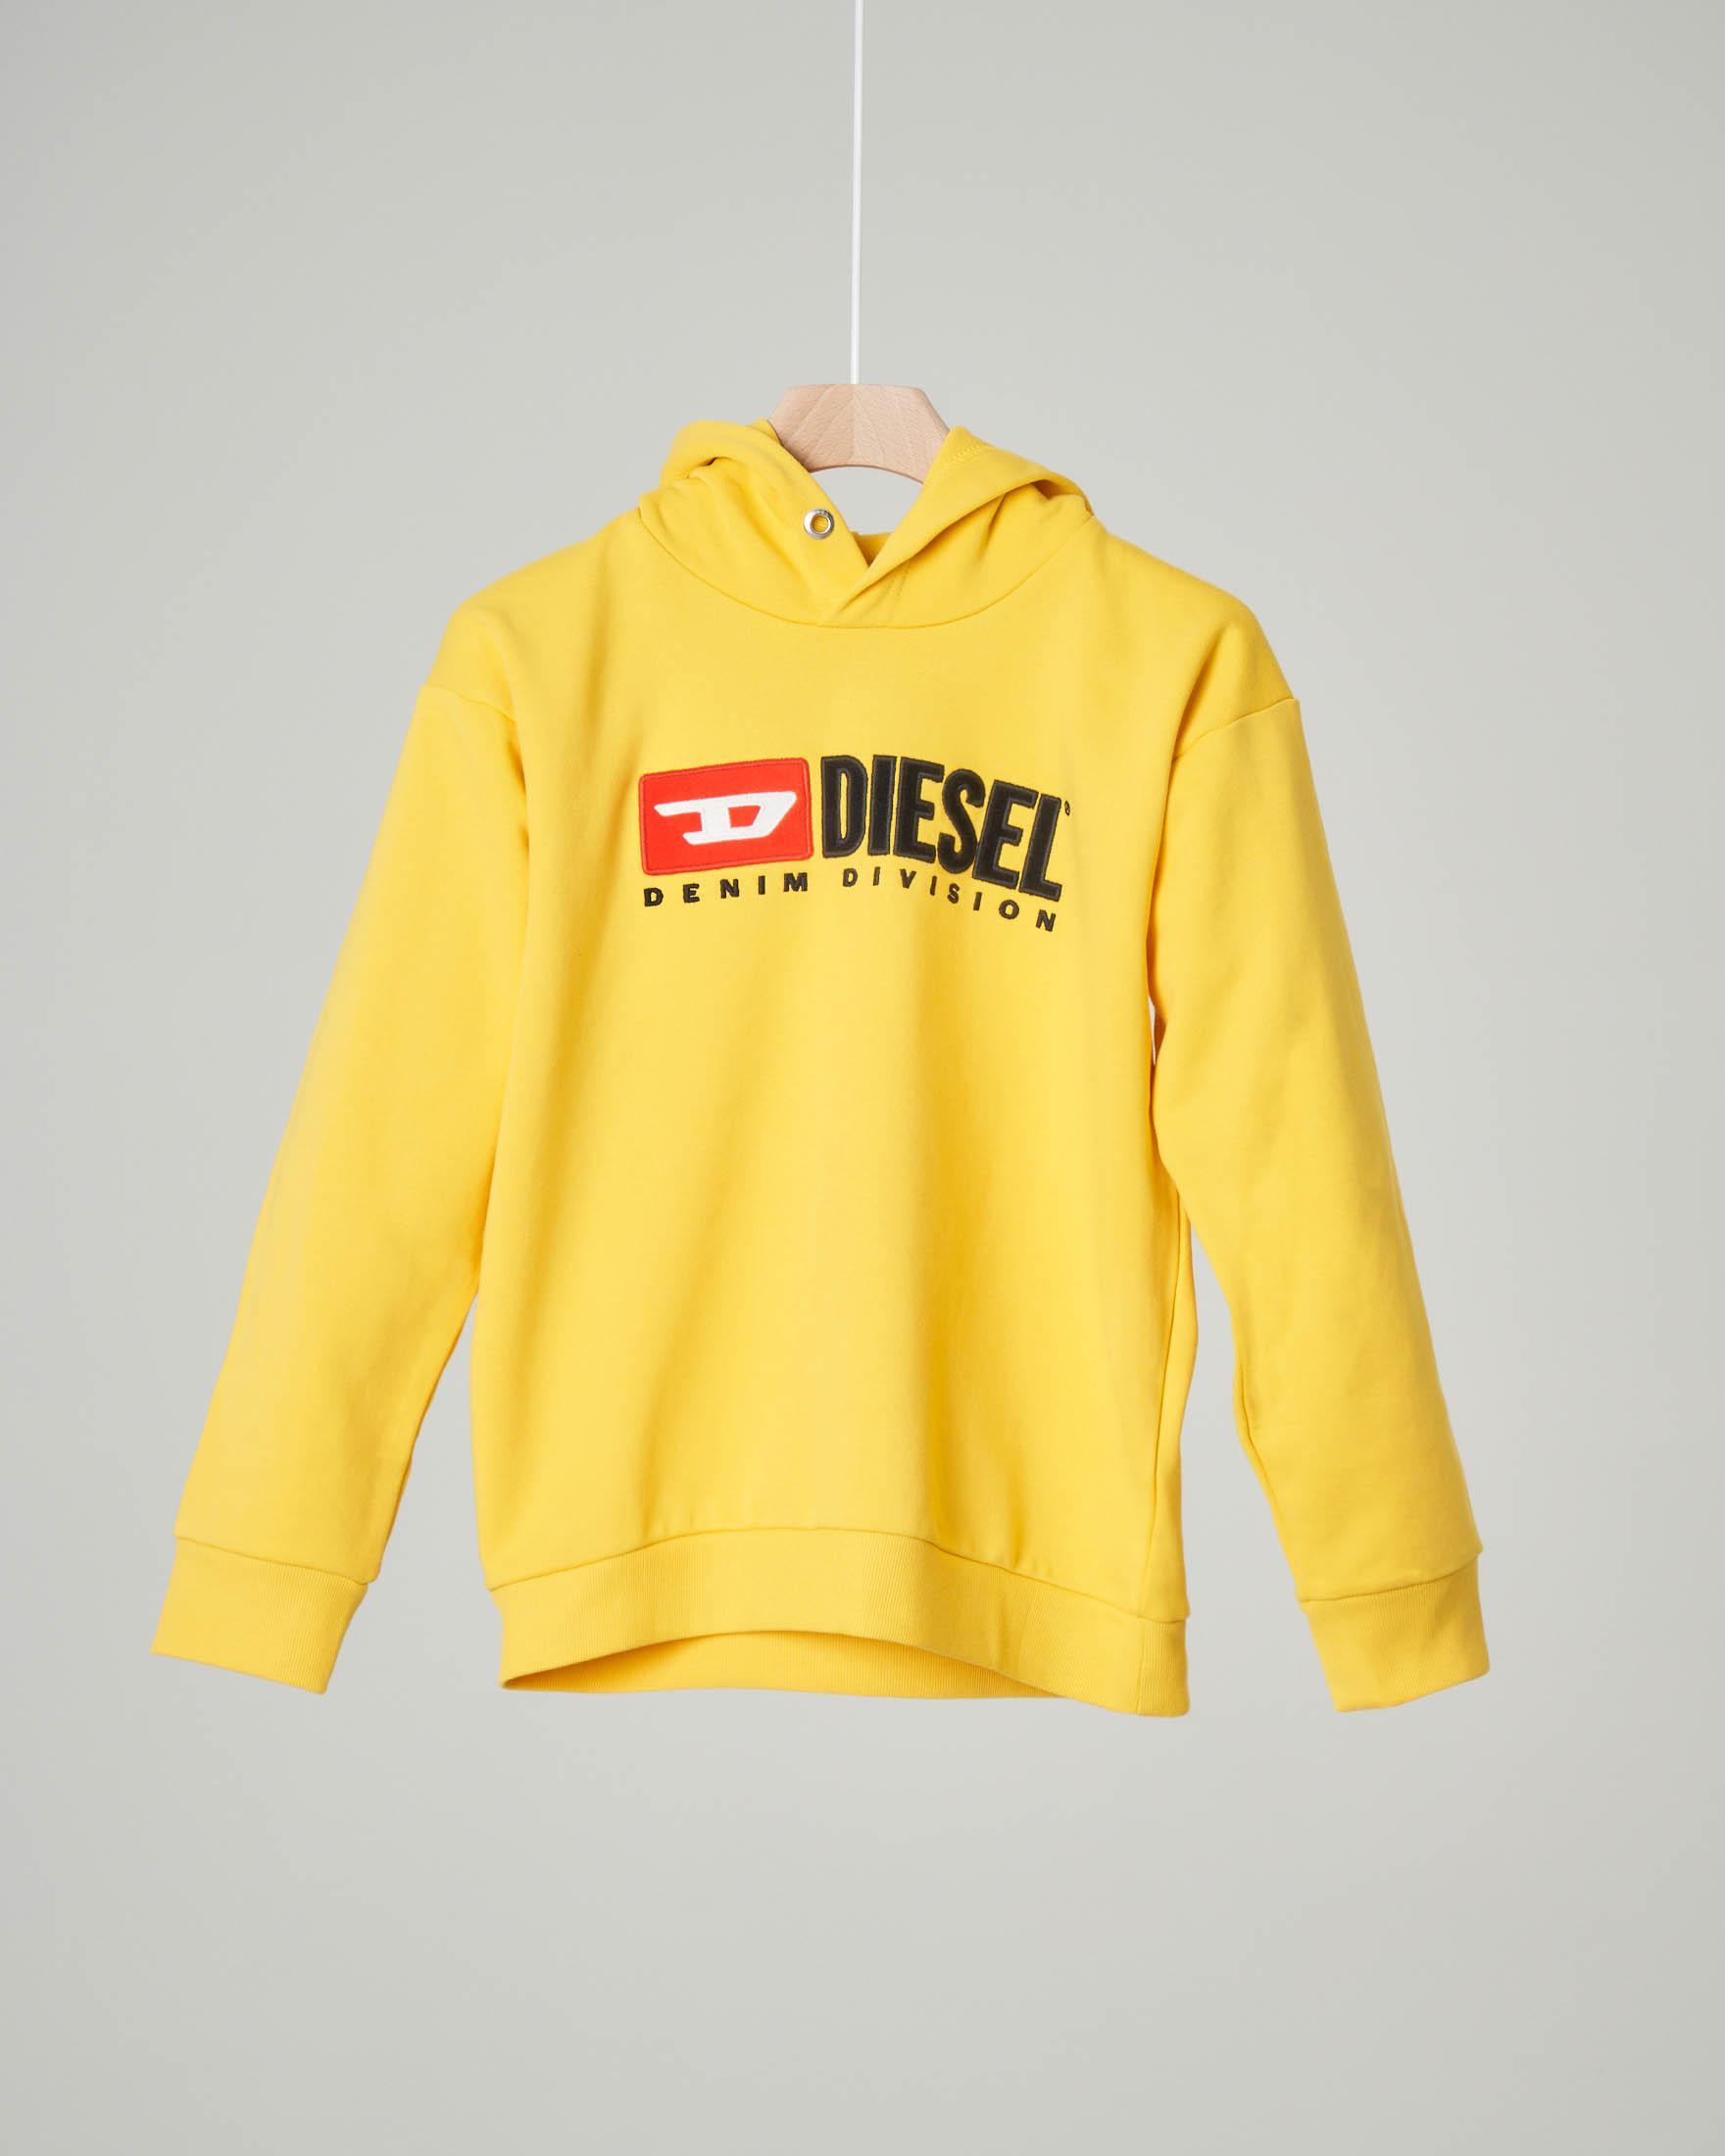 Felpa gialla con cappuccio e logo vintage in feltro 8-16 anni